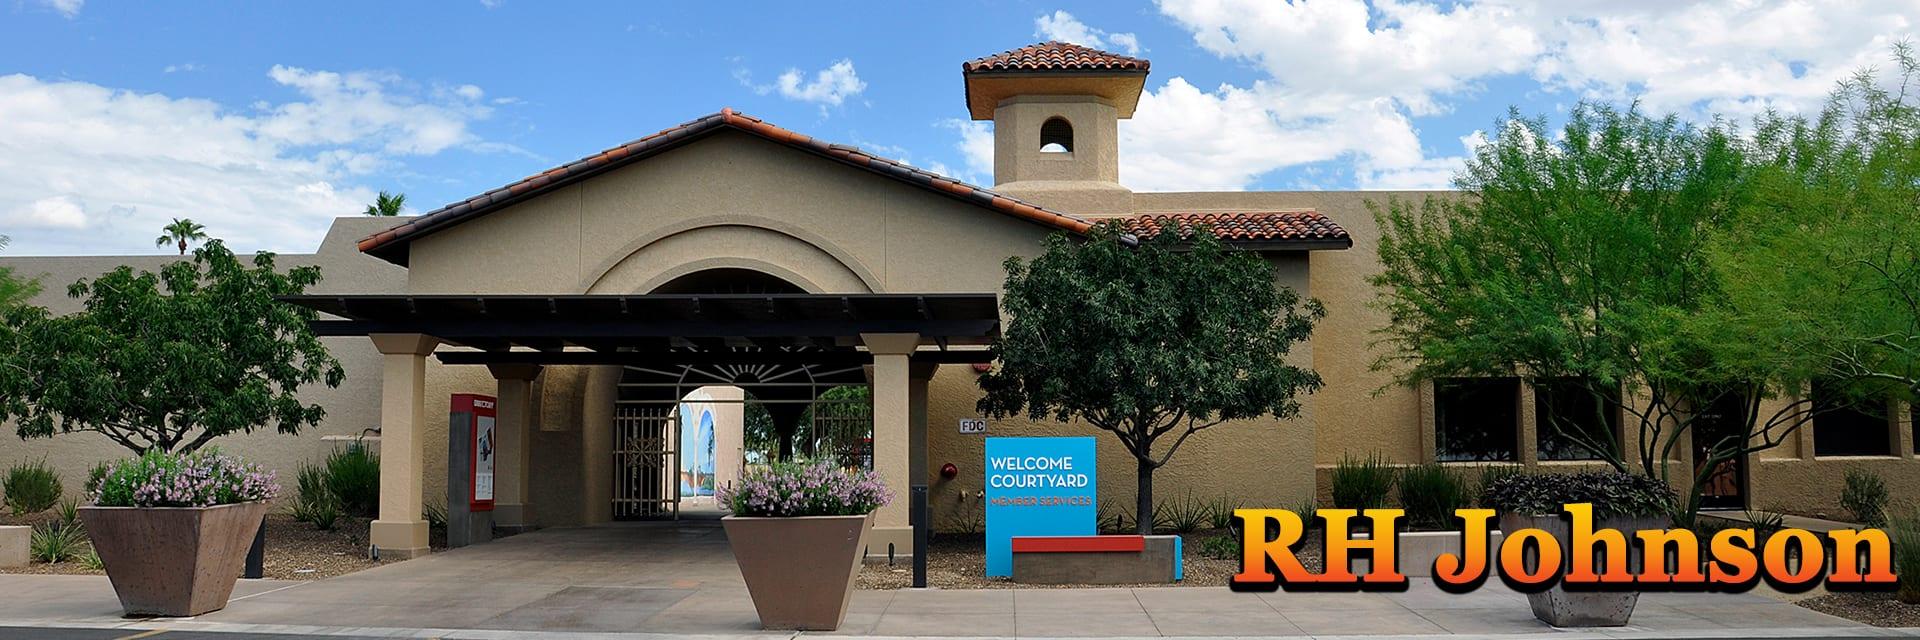 RH Johnson Recreation Center at Sun City West AZ